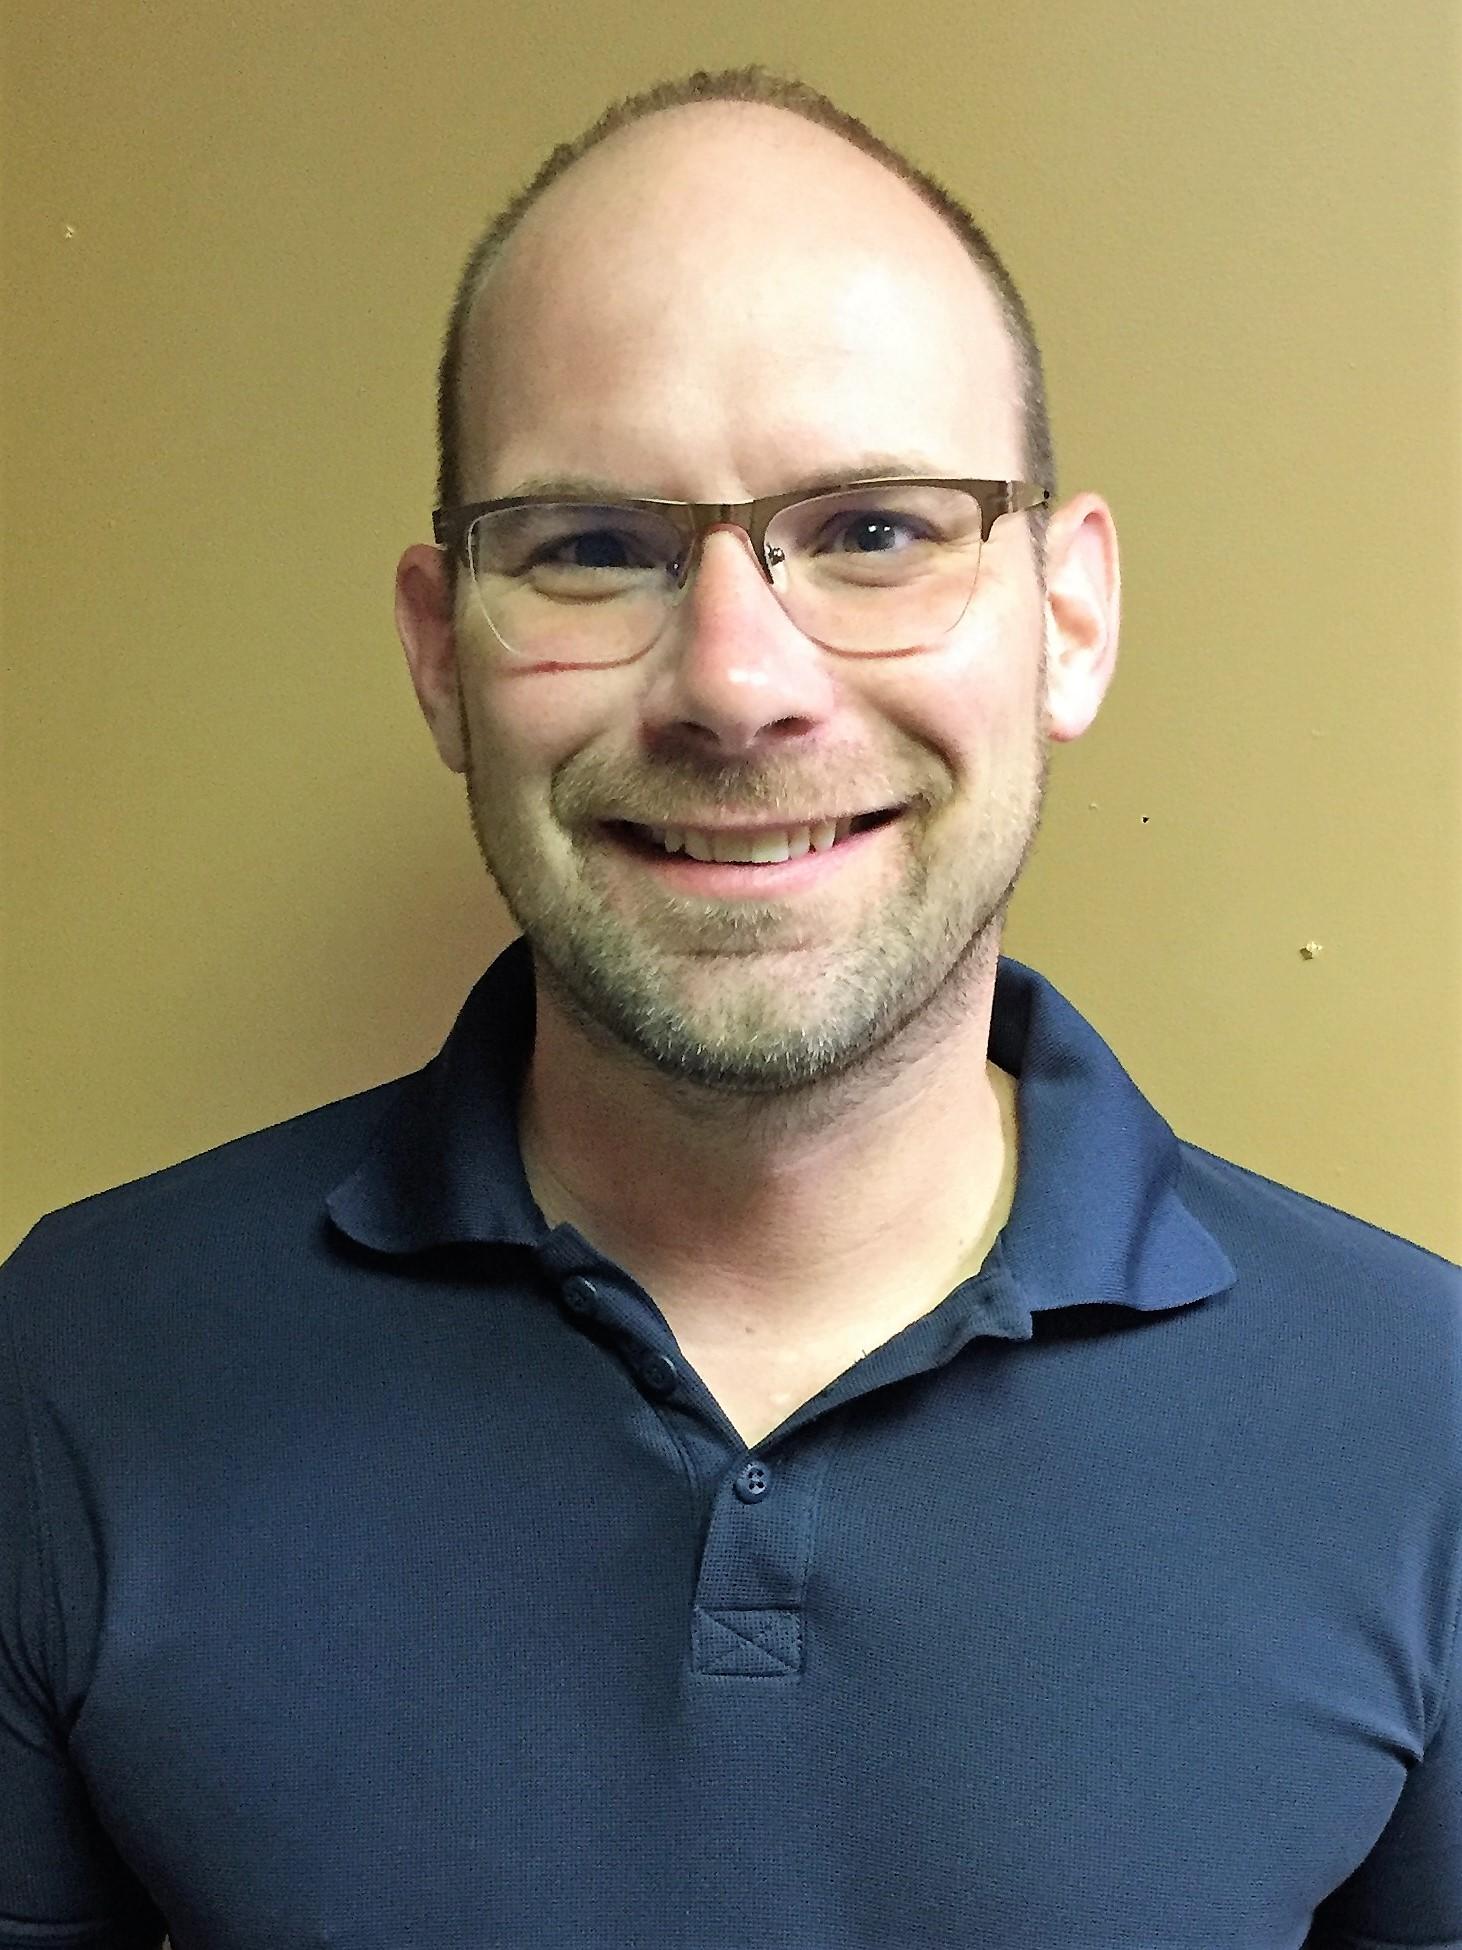 Josh Billington, Small Business Development Center